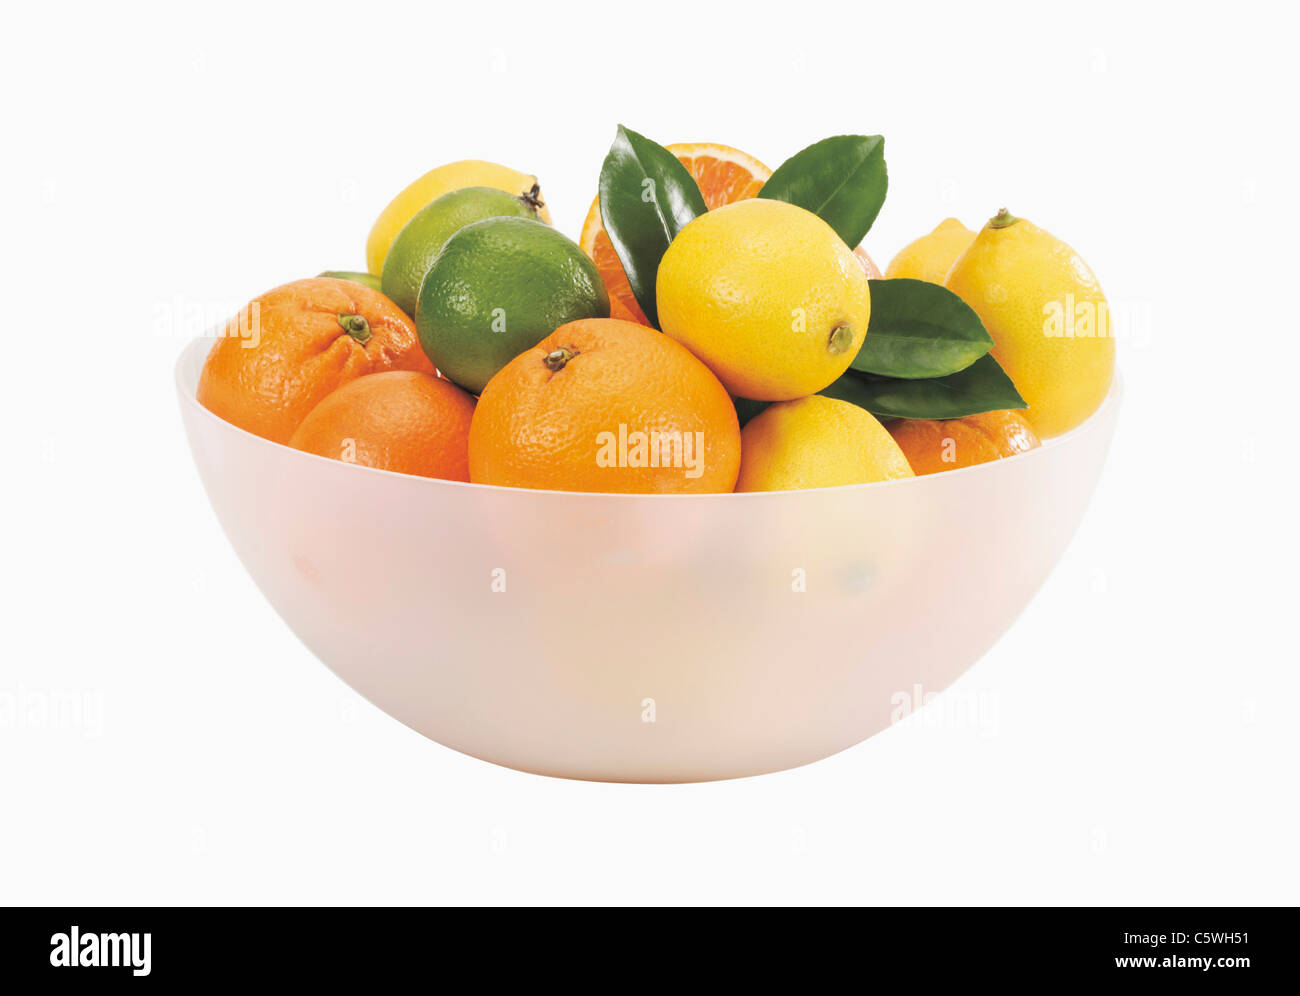 Bowl with fresh oranges and lemons against white background - Stock Image